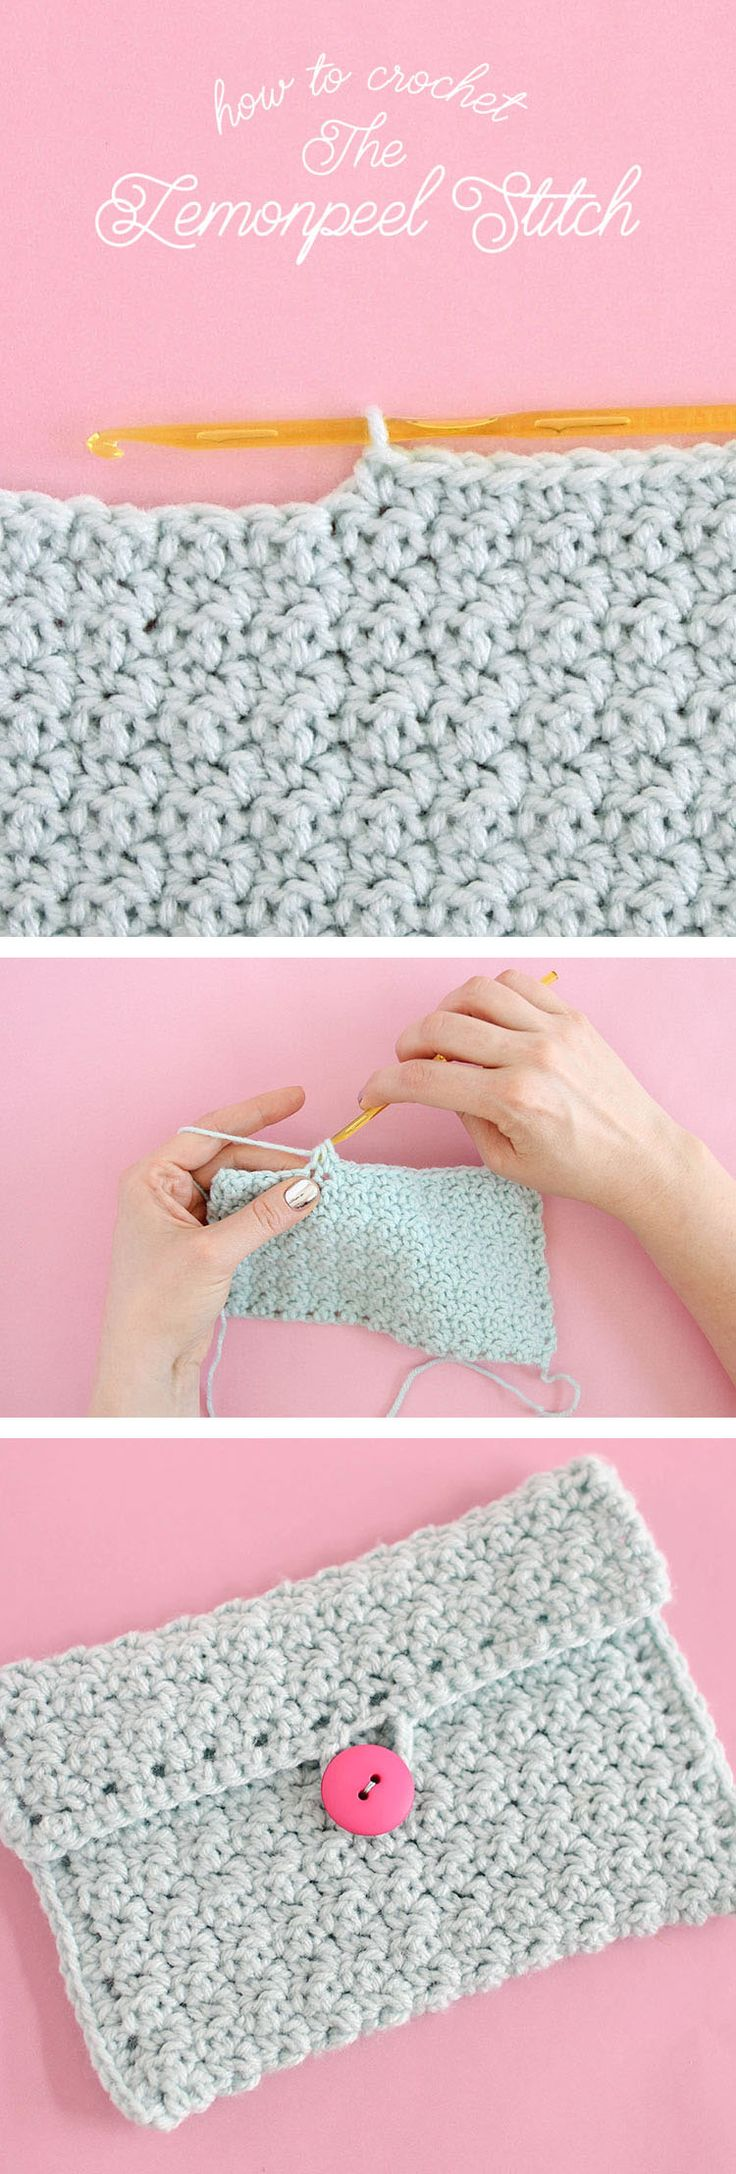 best crochet ideas images on pinterest crochet patterns